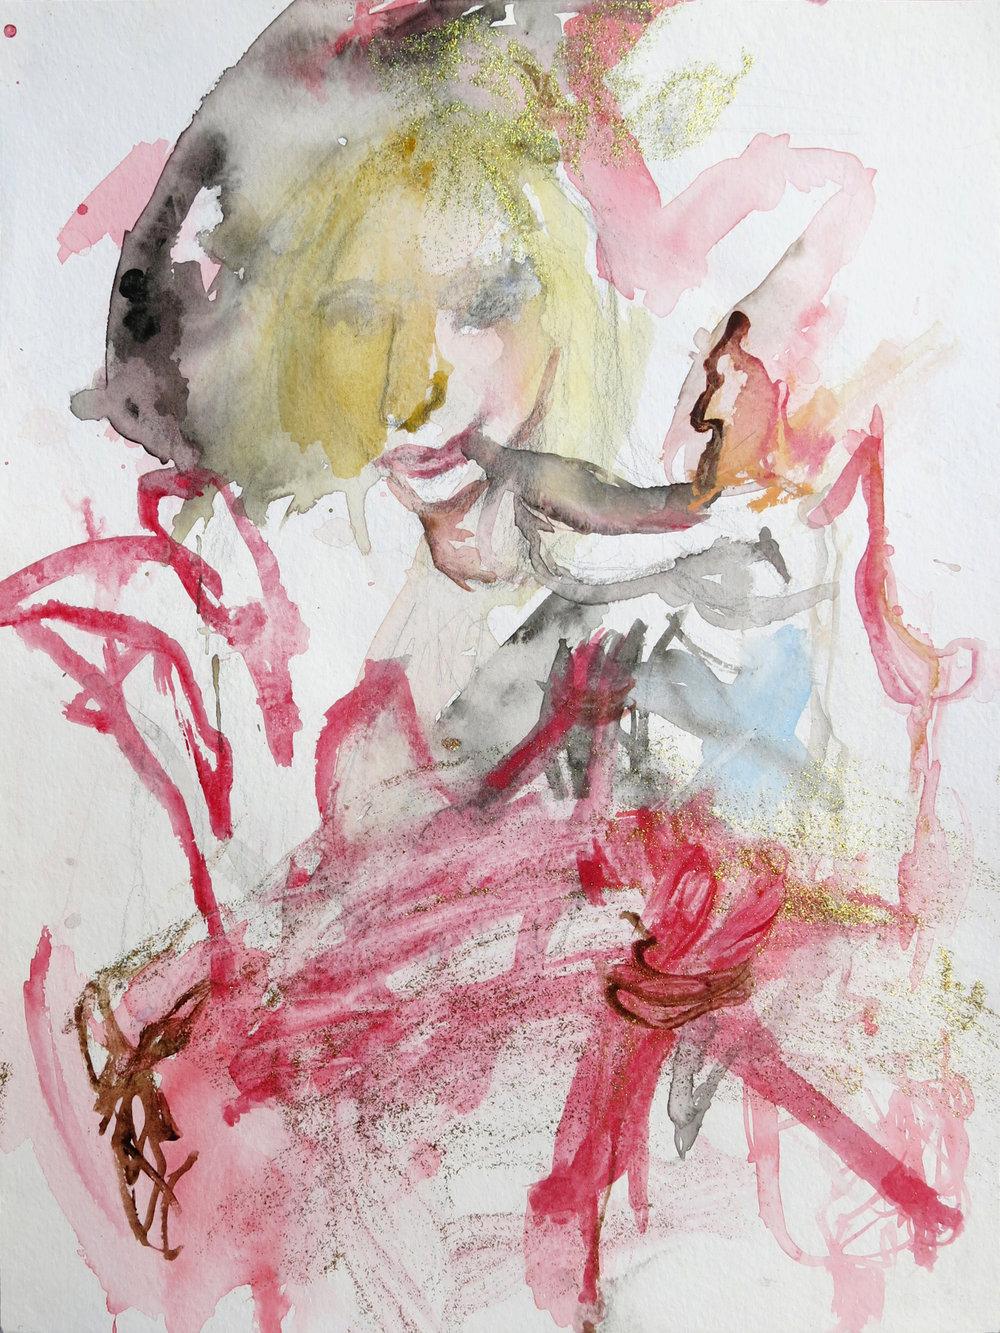 Barbra Streisand Portrait #207